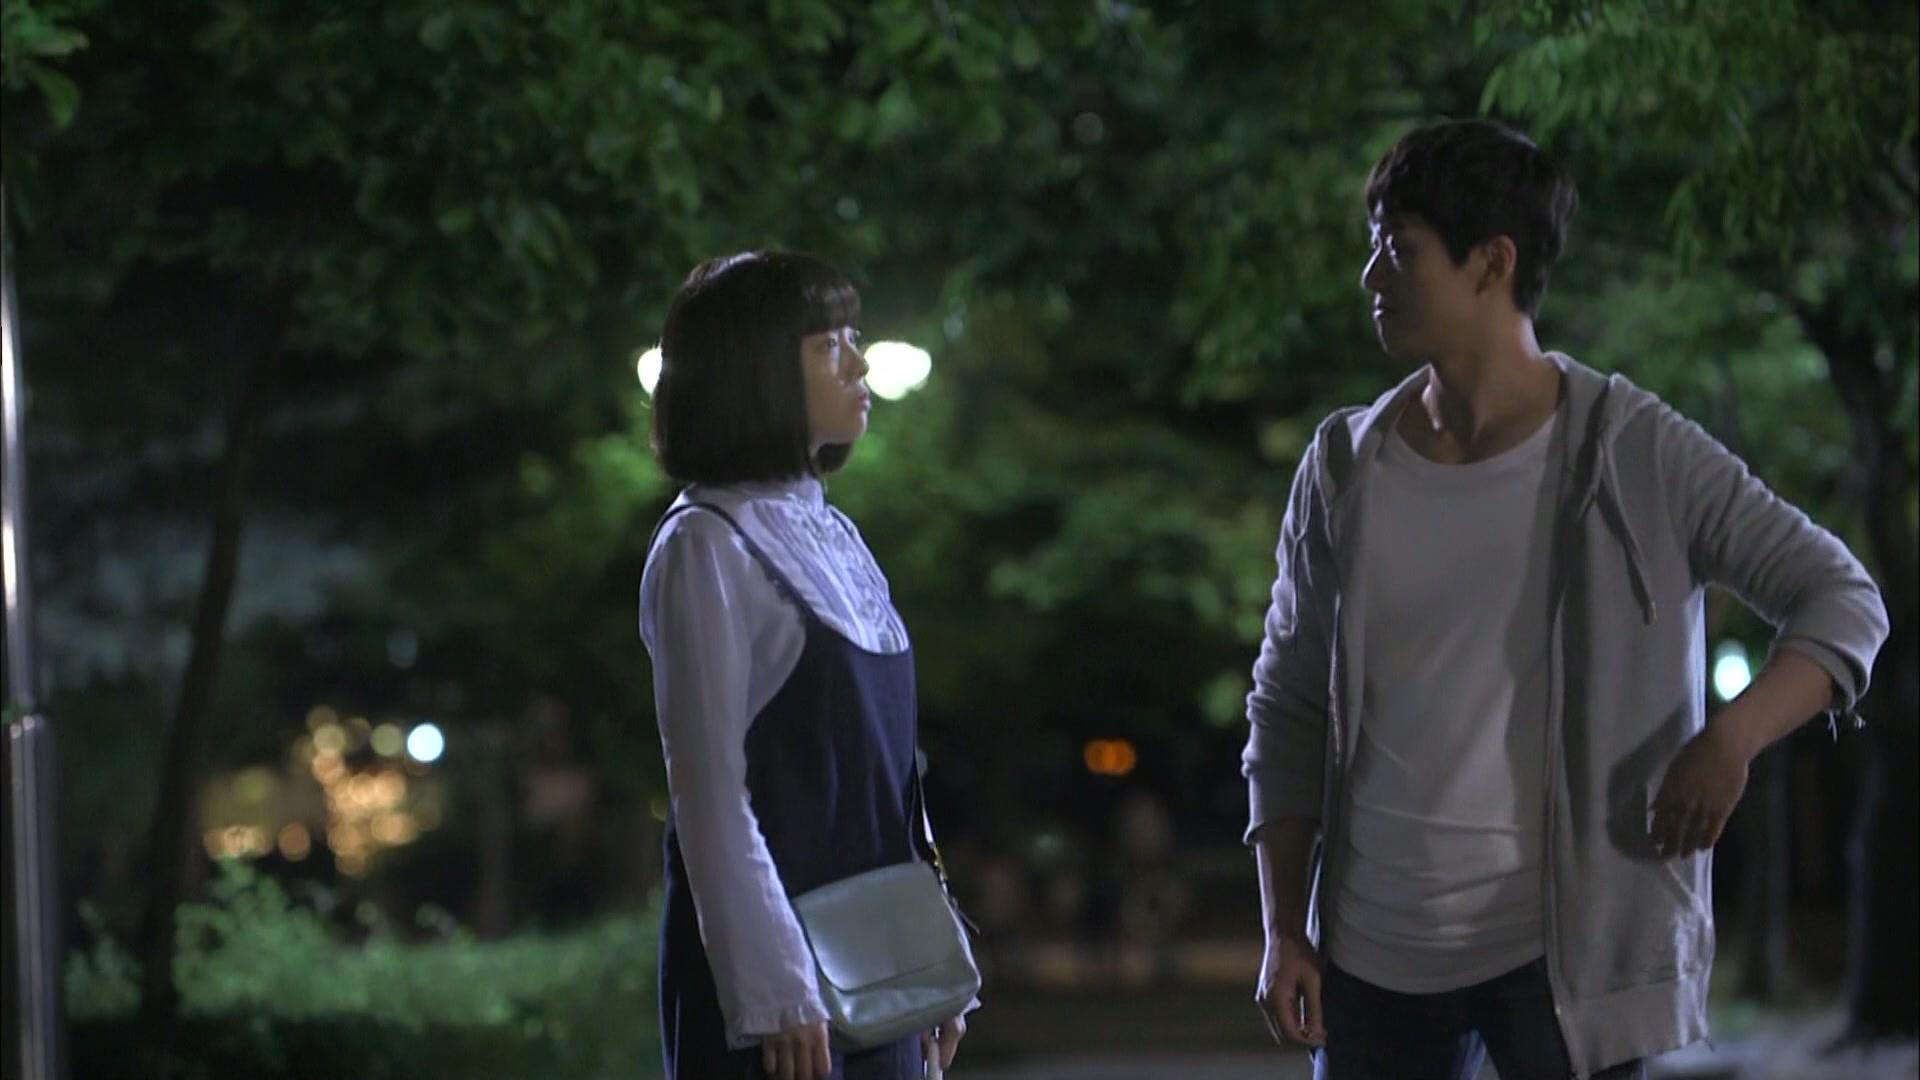 Dear Fair Lady Kong Shim Episode 4